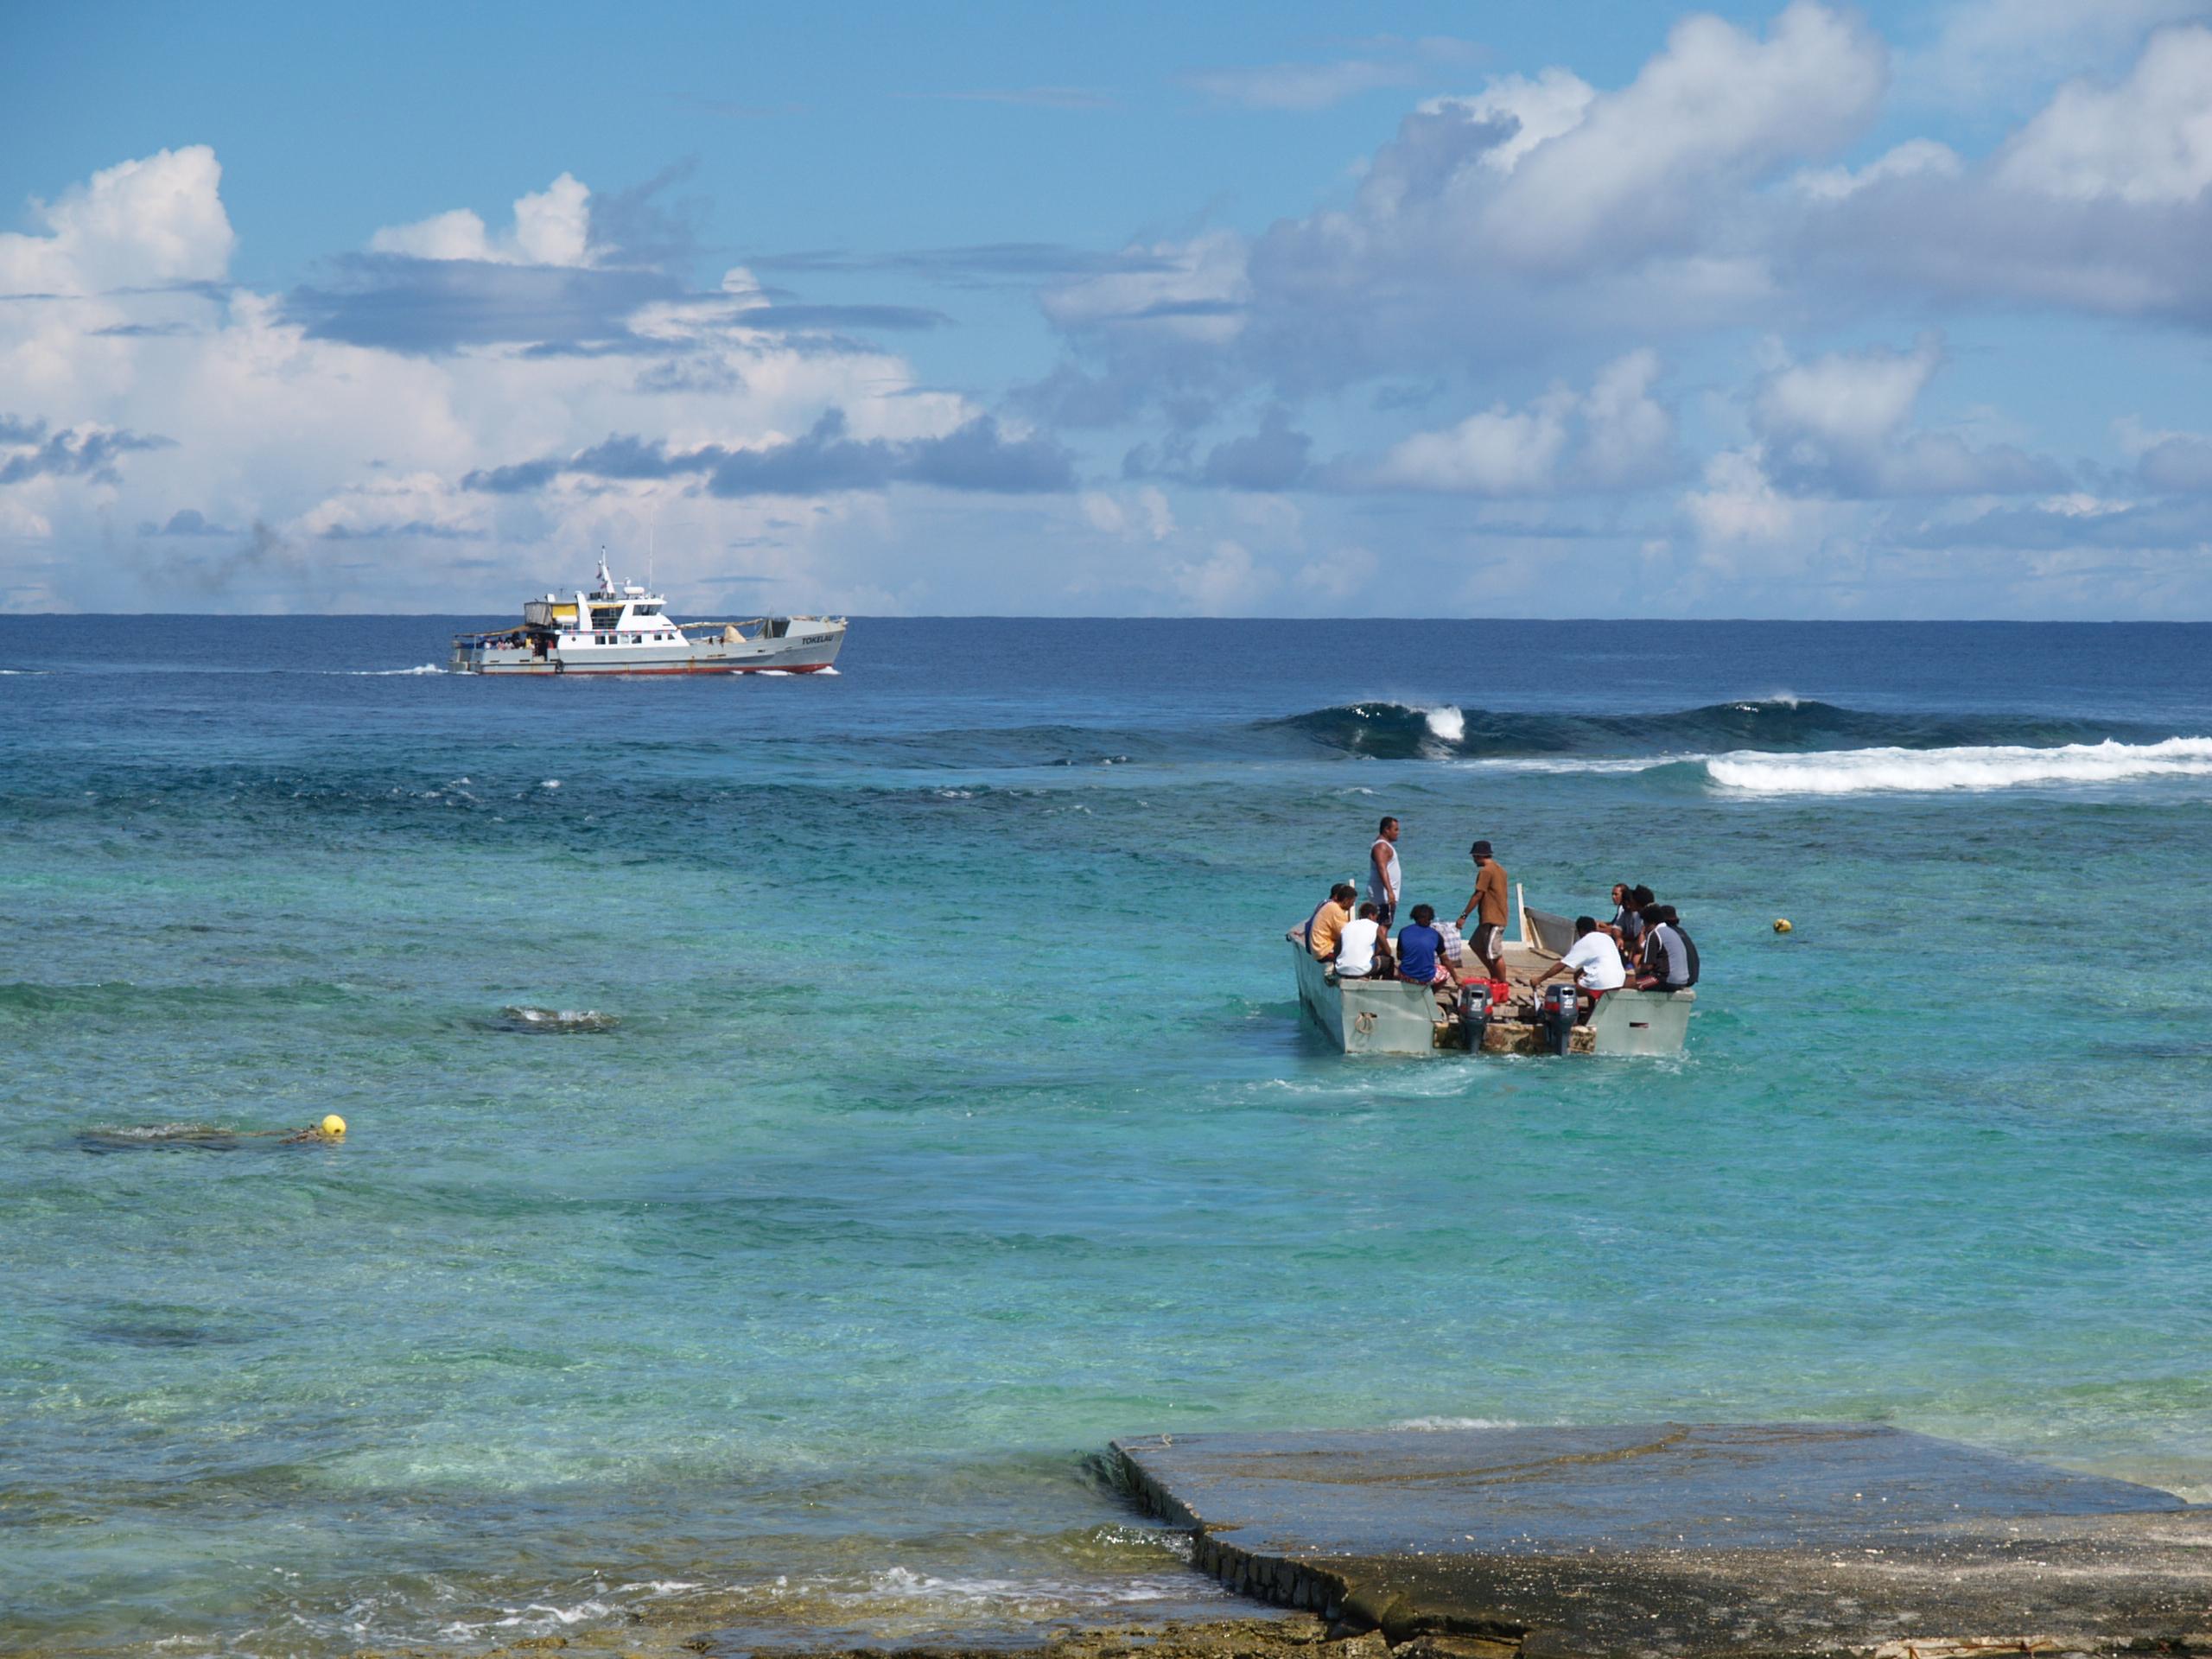 Ferrying supplies to Tokelau. Photo taken on July 8, 2007.